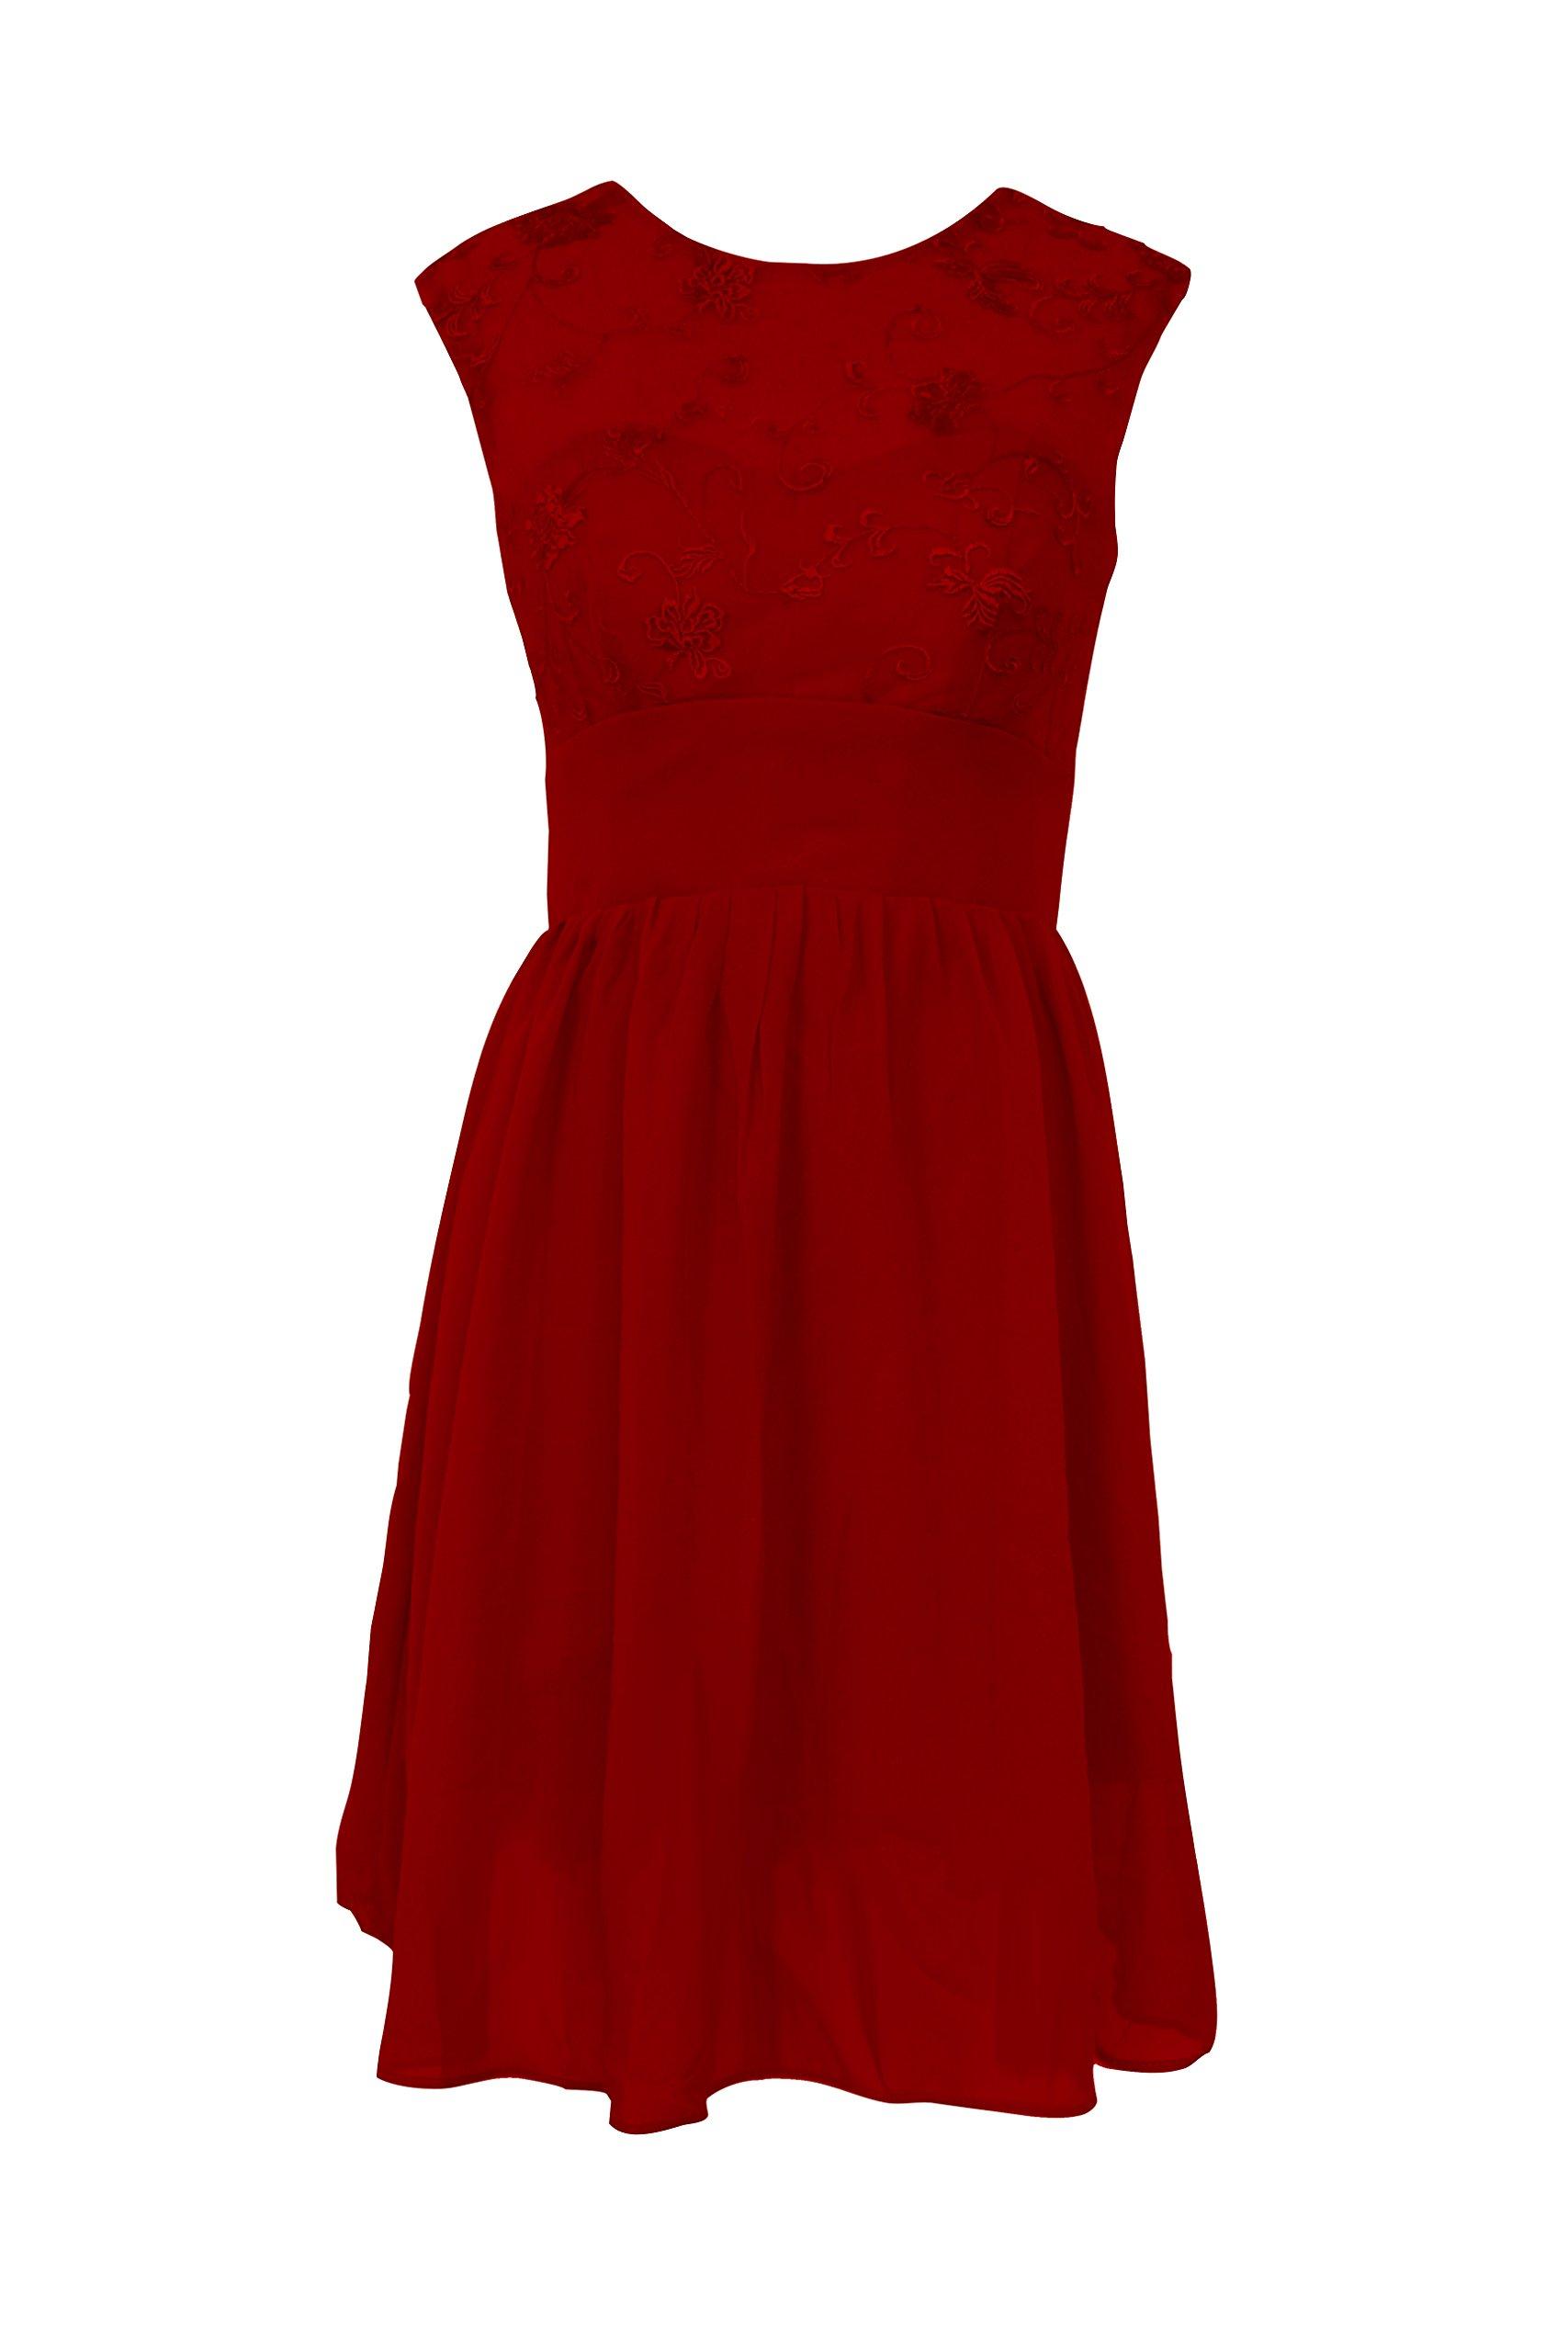 CaliaDress Women Sleeveless See-Through Short Prom Bridesmaid Dress C011LF Burgundy US12